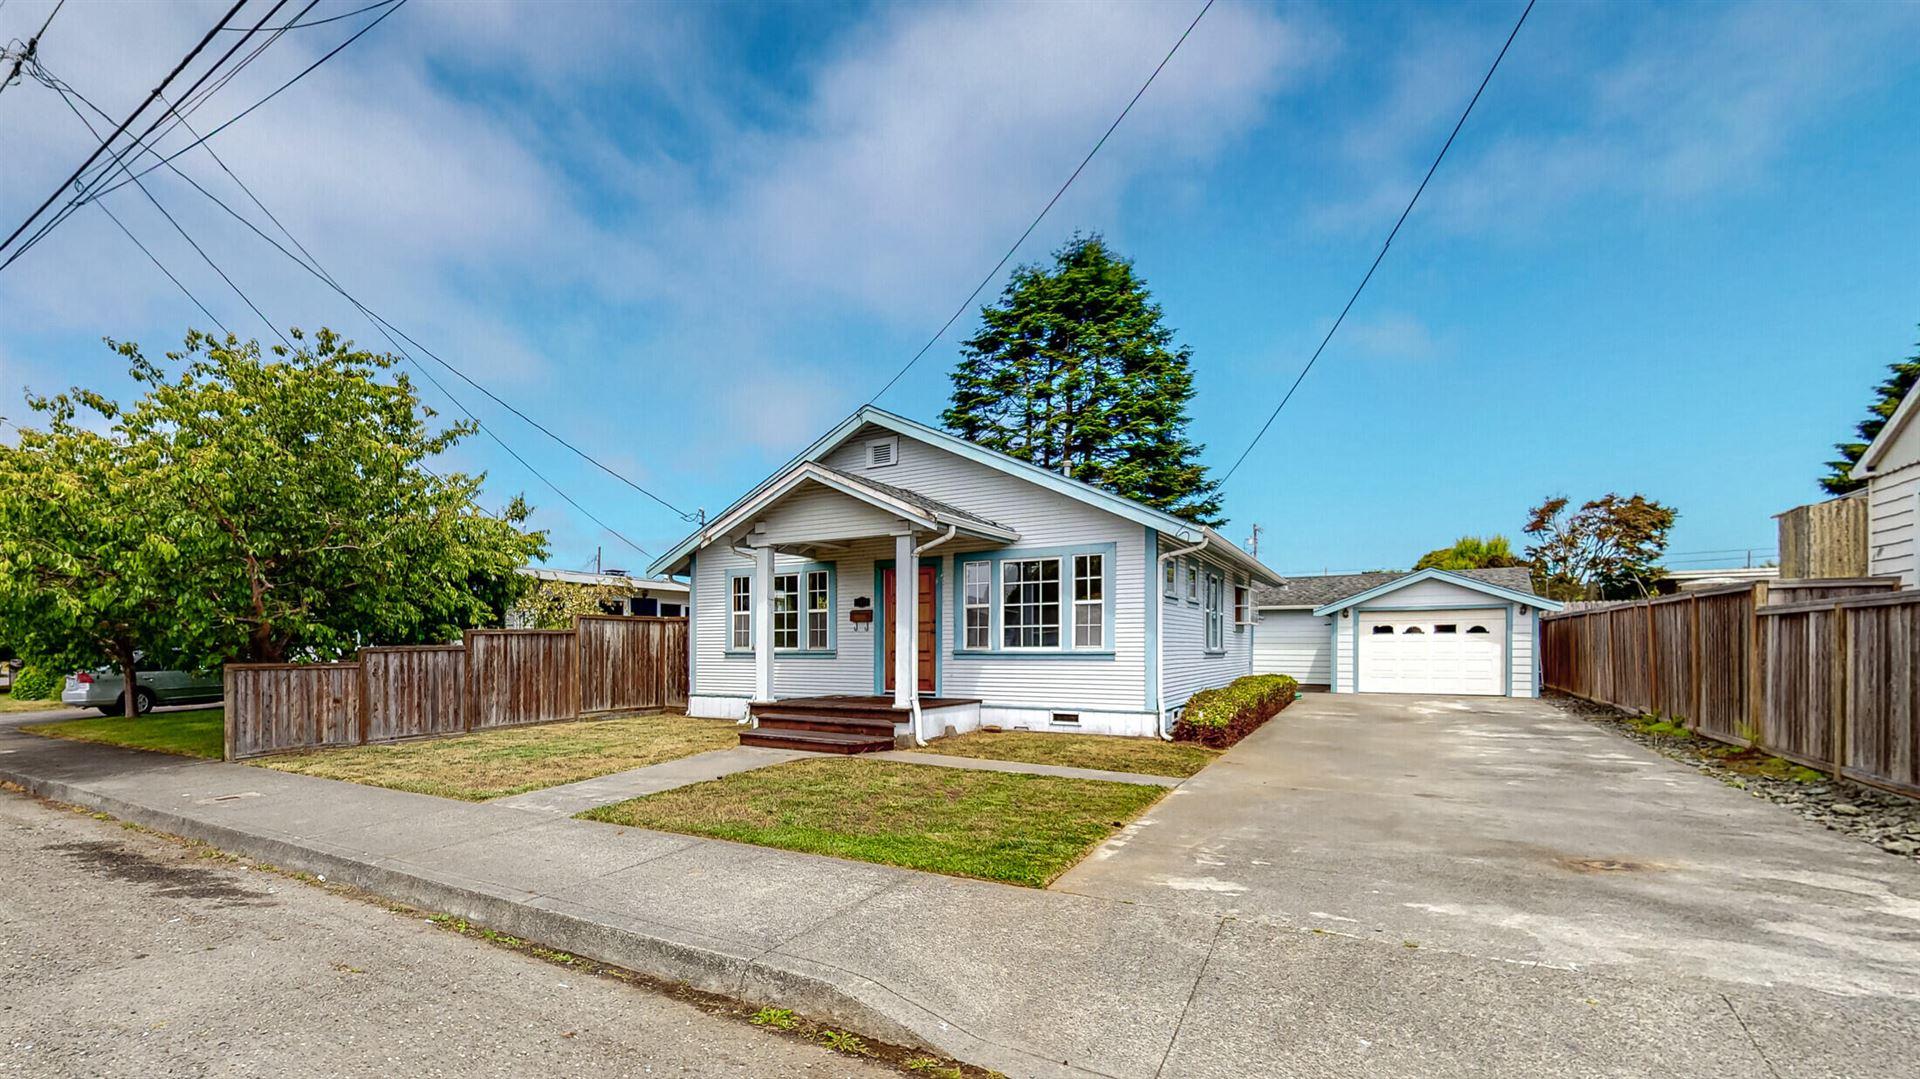 2917 C Street, Eureka, CA 95501 - MLS#: 259511